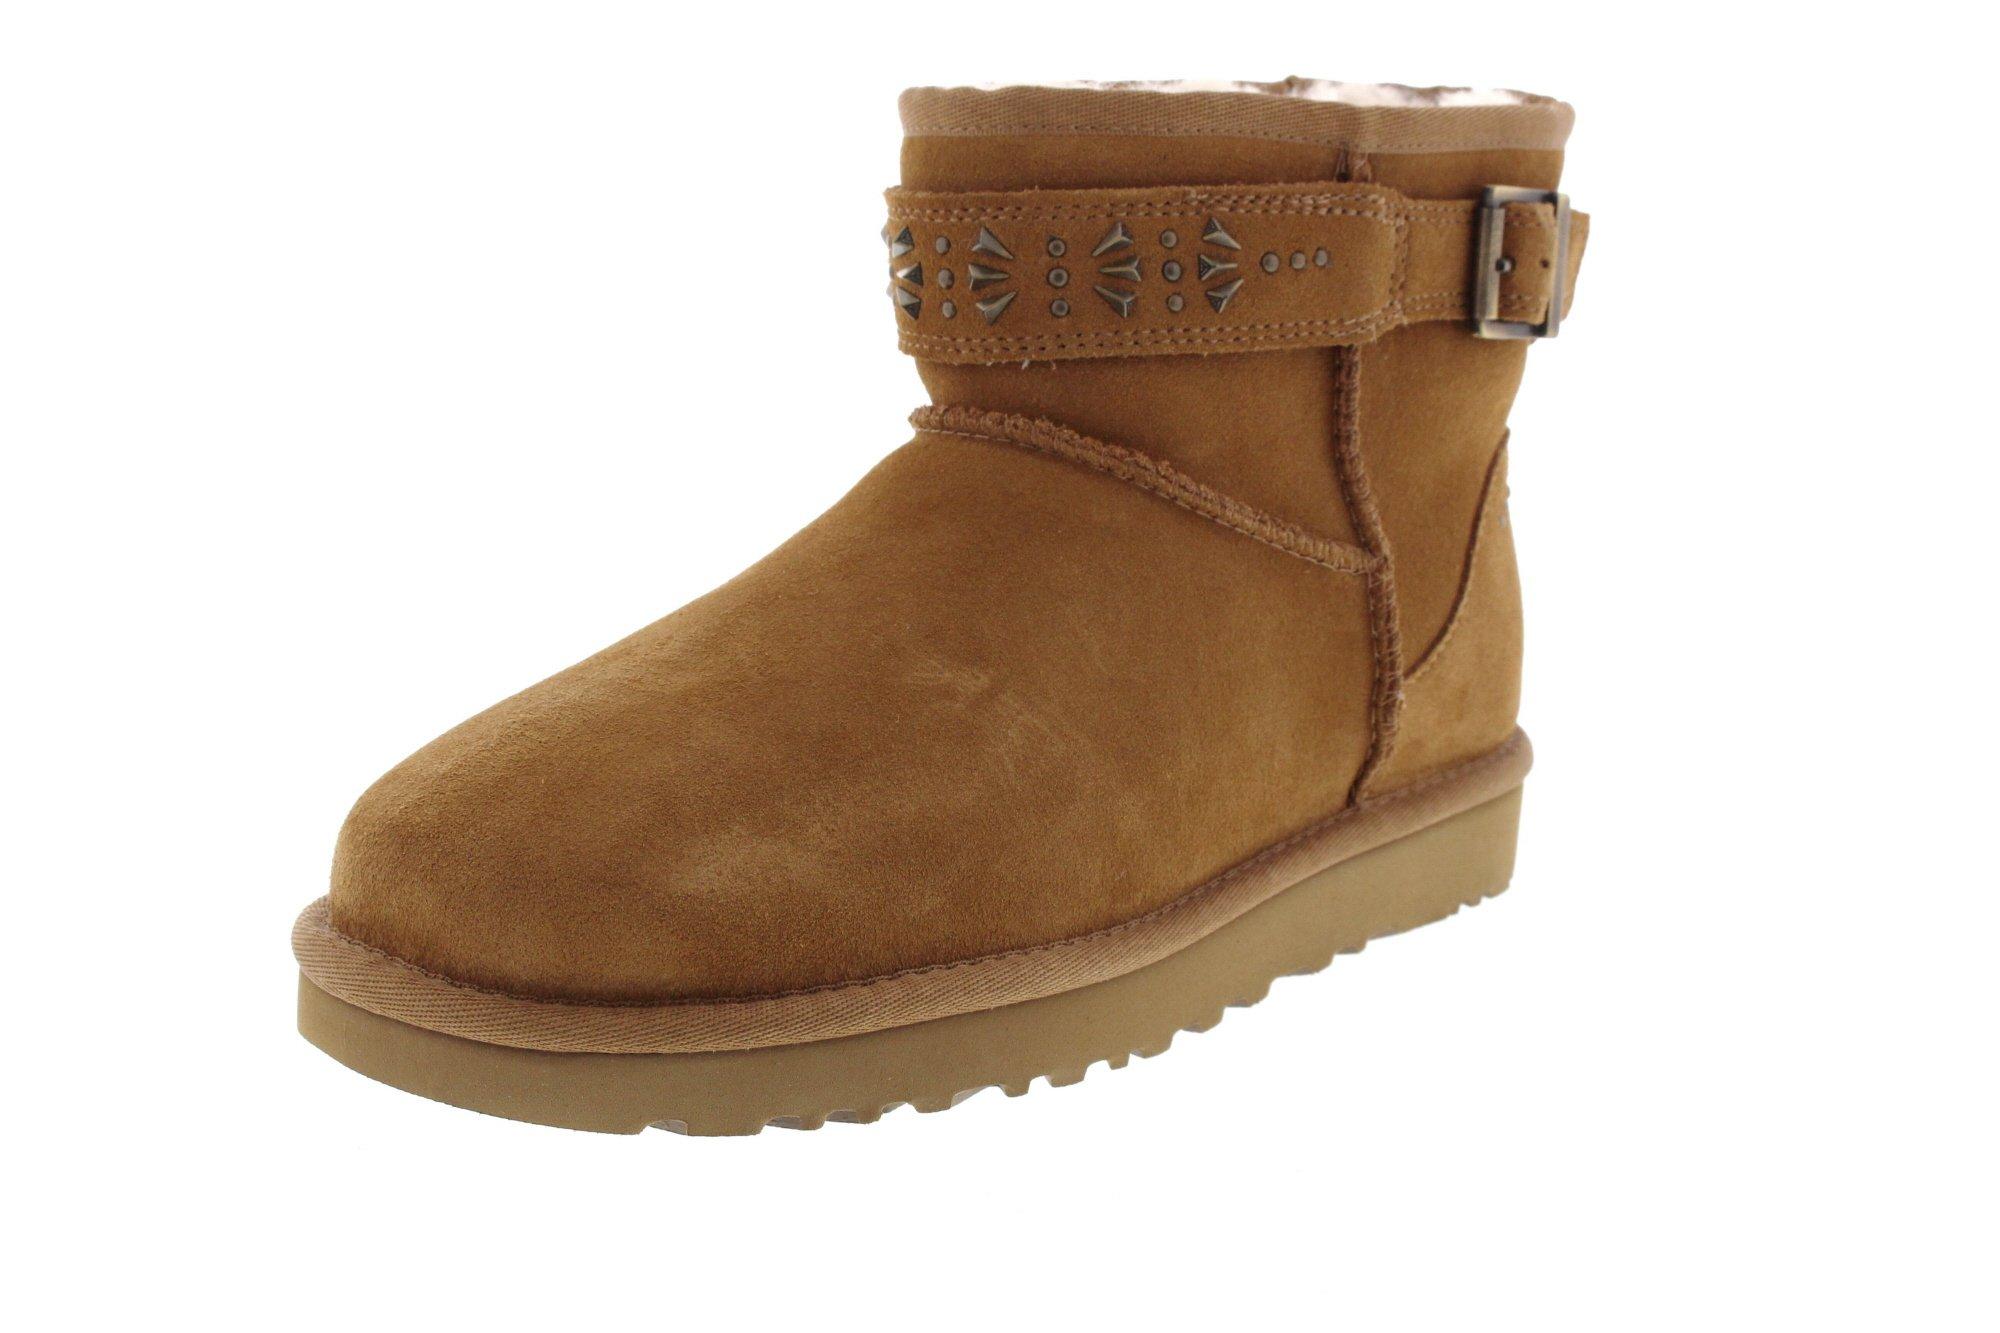 UGG Womens Jadine Shearling boot Chestnut Size 7